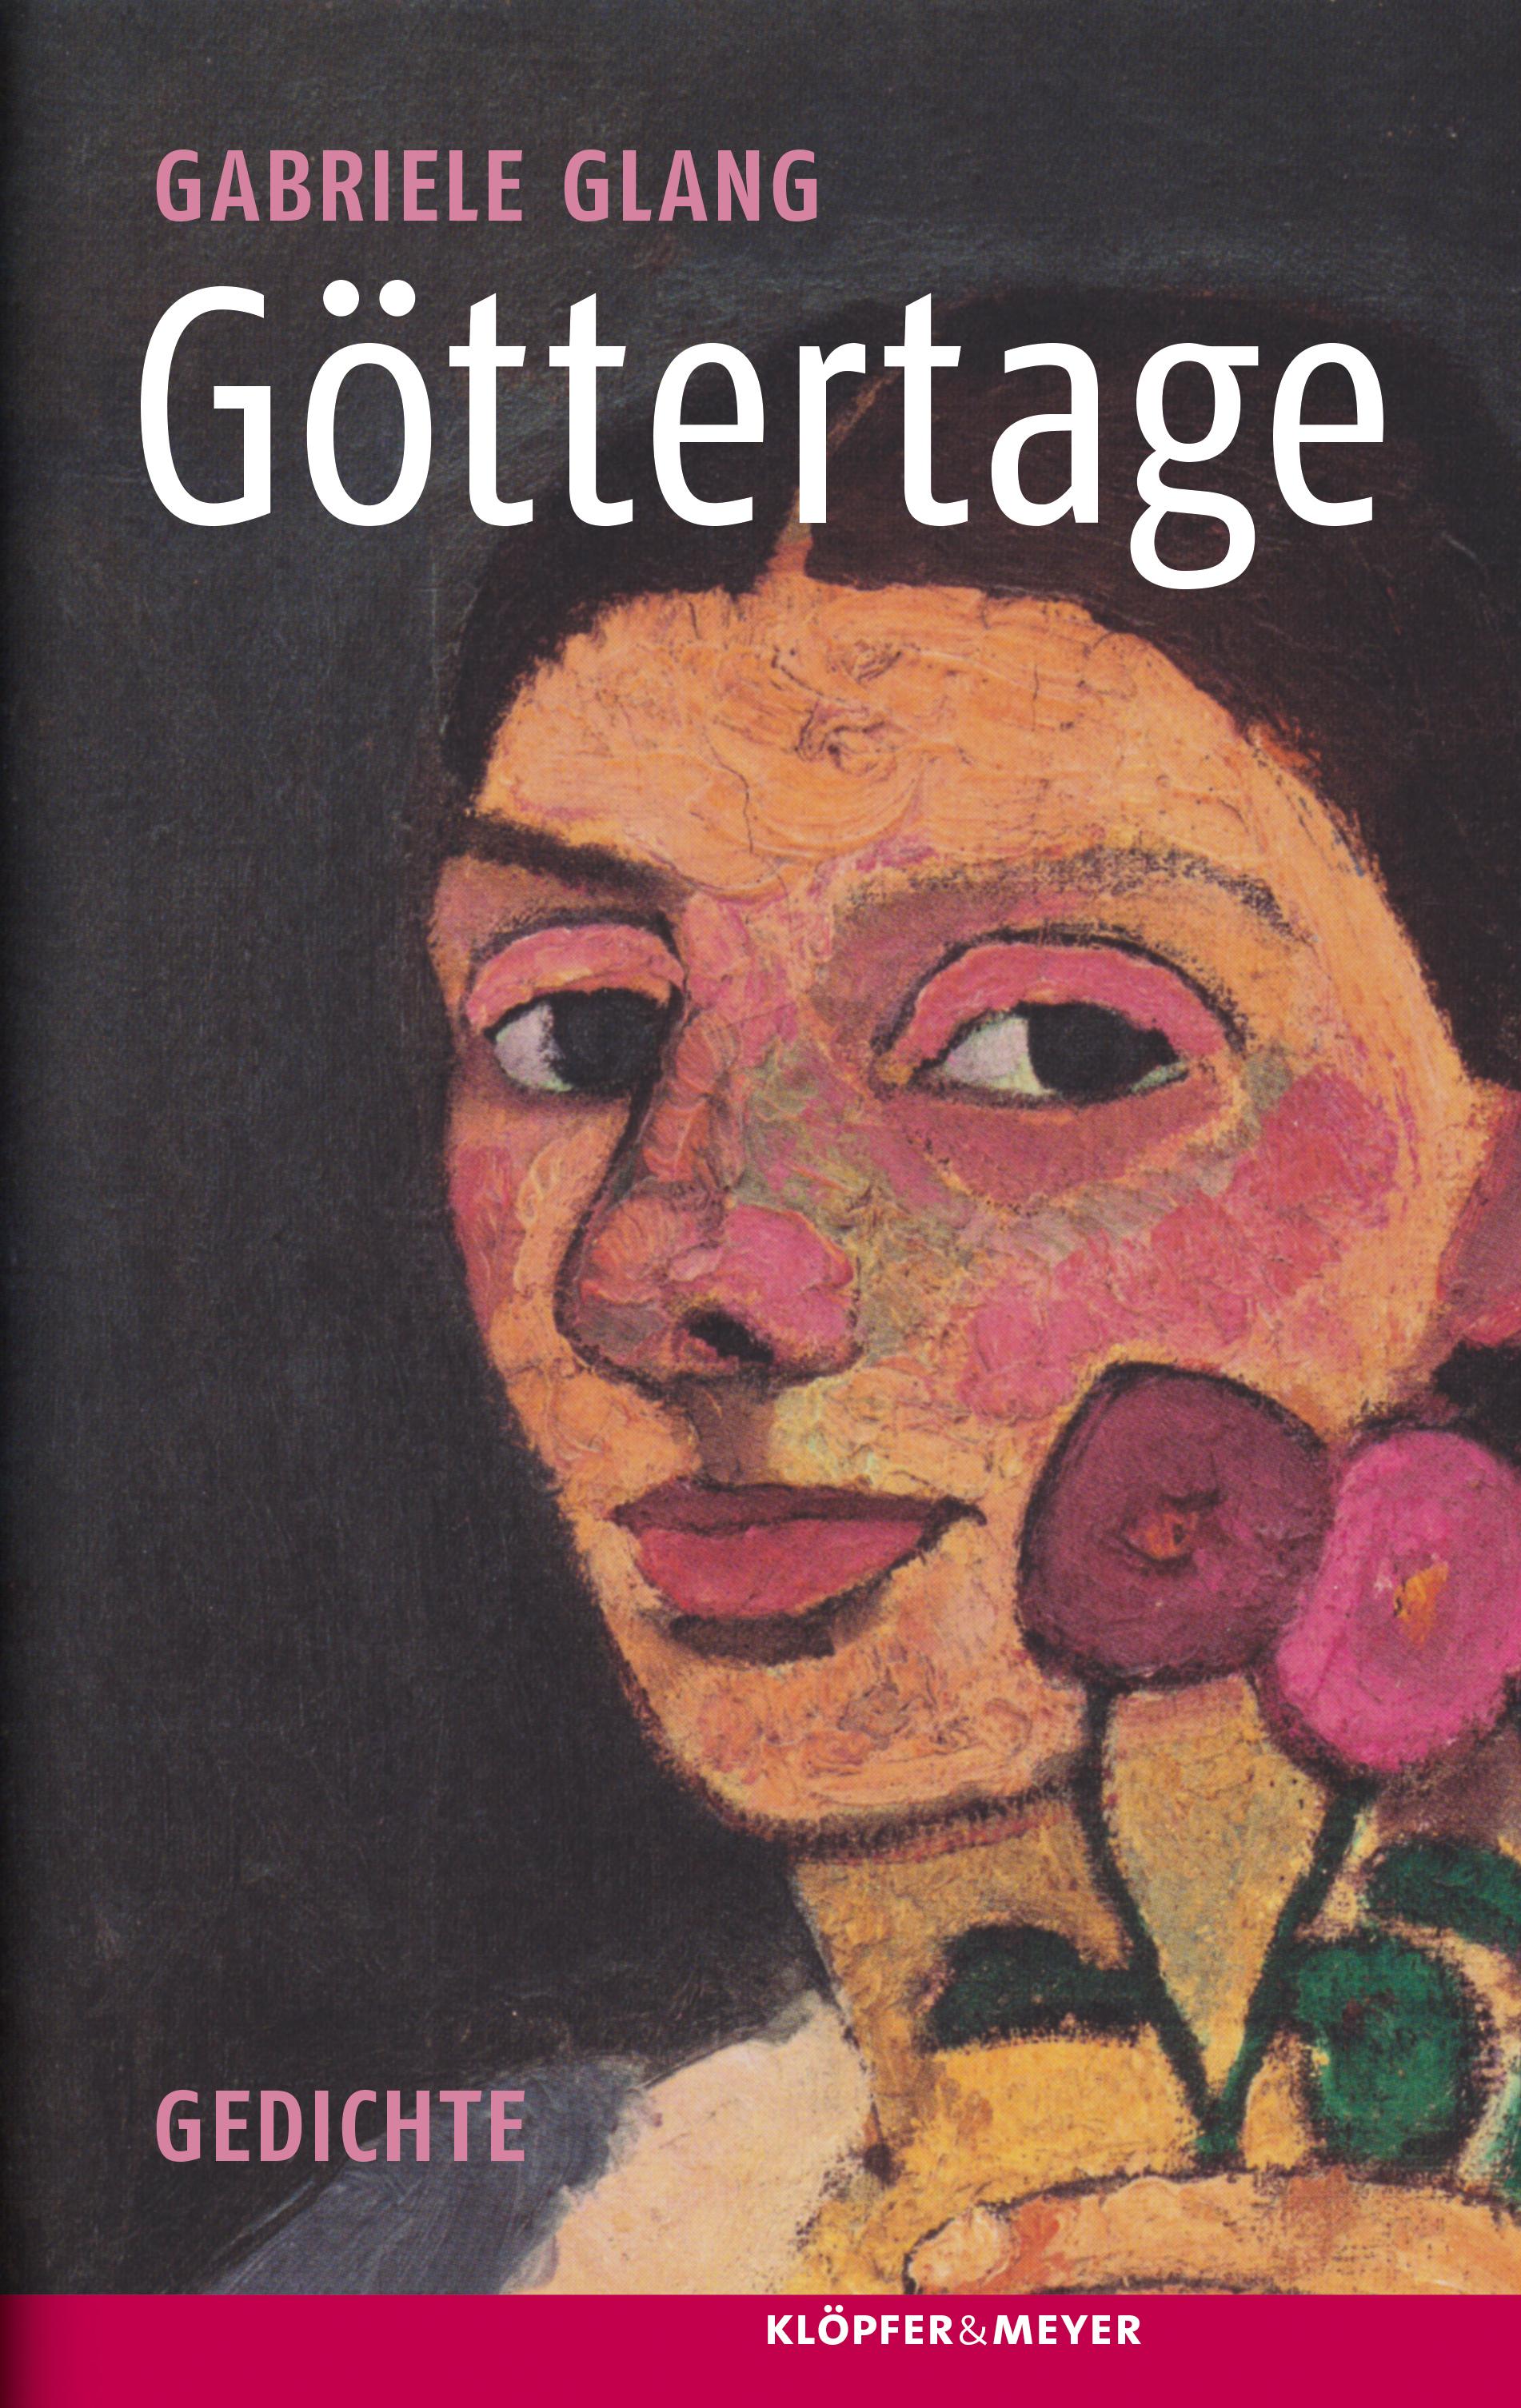 Goettertage-Gabriele-Glang